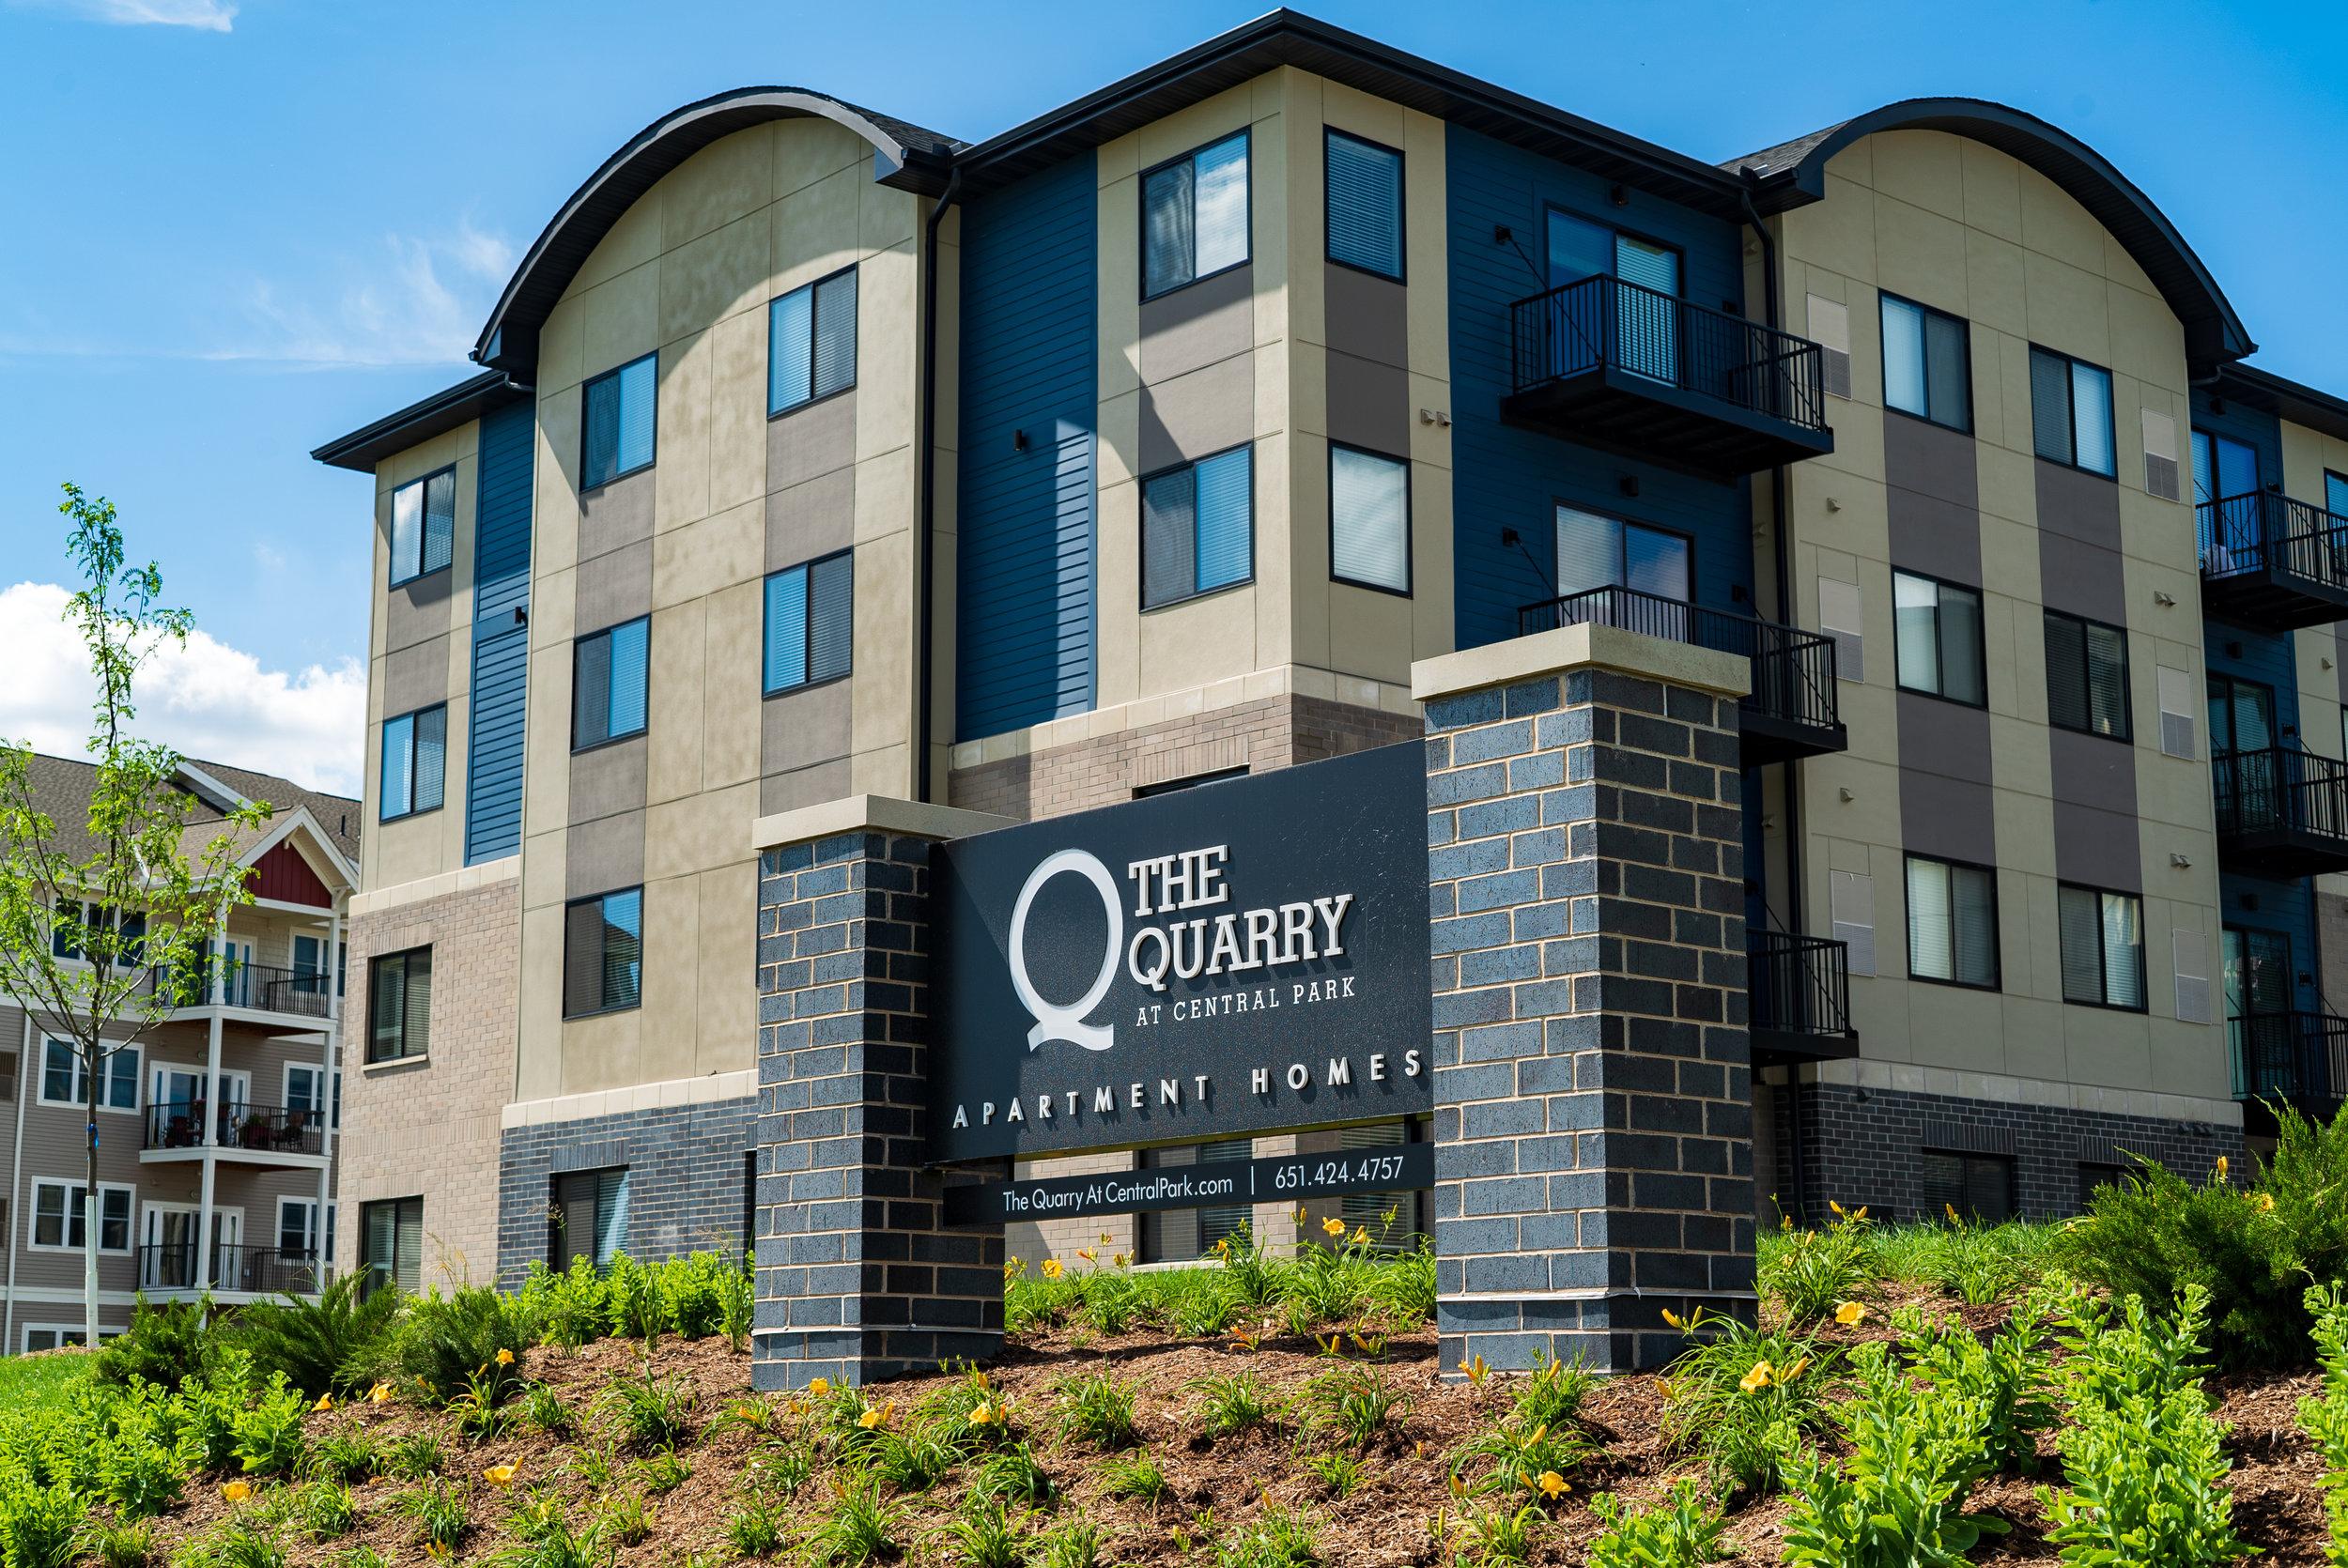 The Quarry Property Wide Print-1.jpg